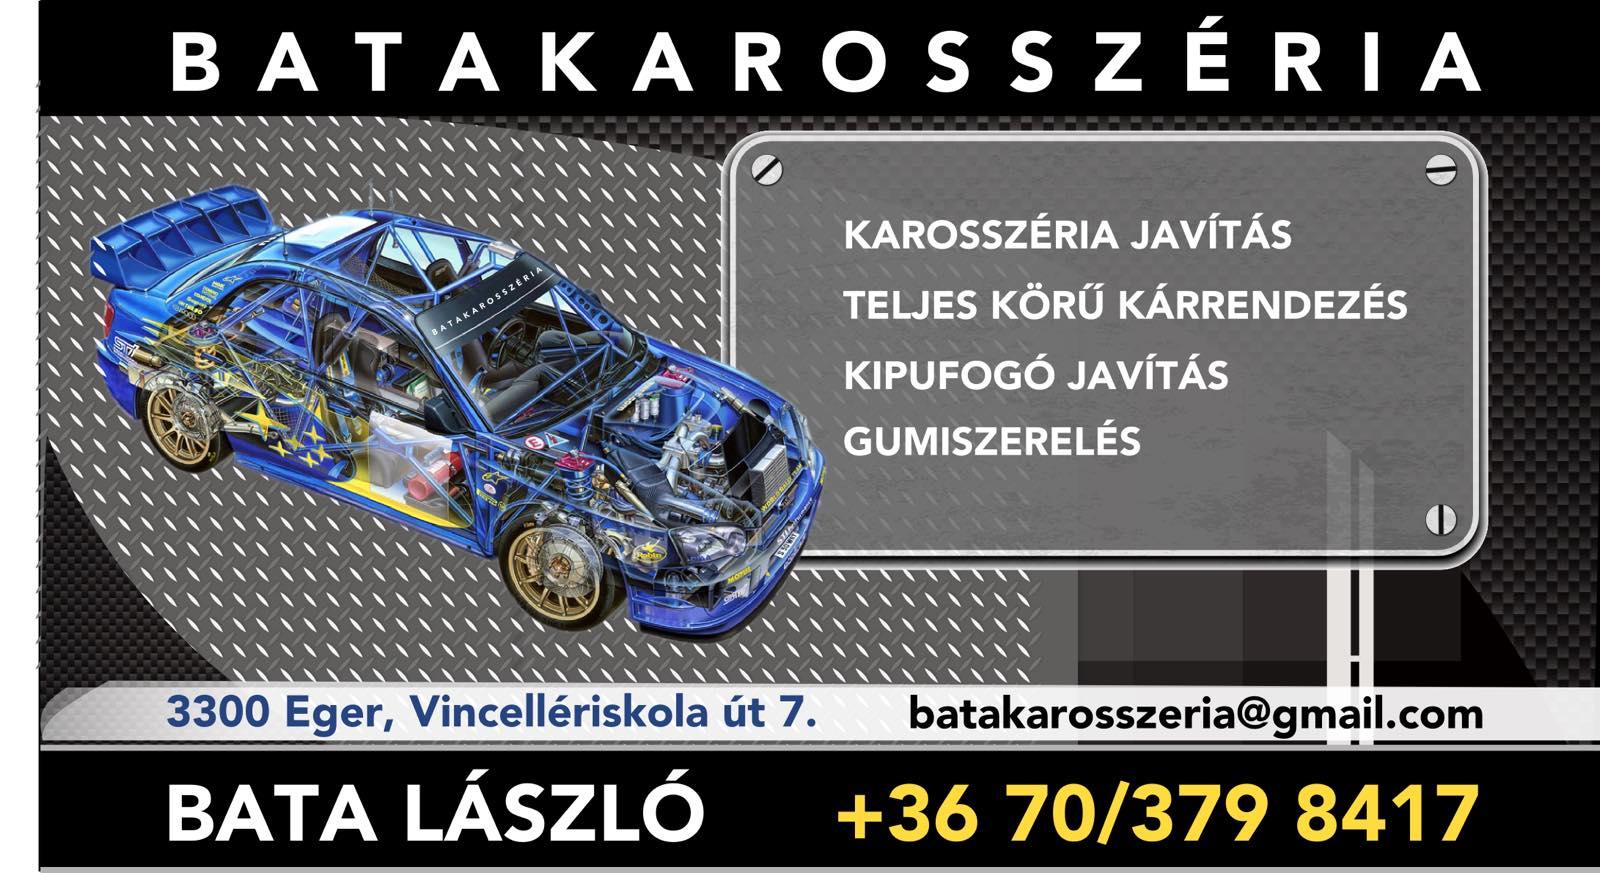 bata-karosszeria-eger